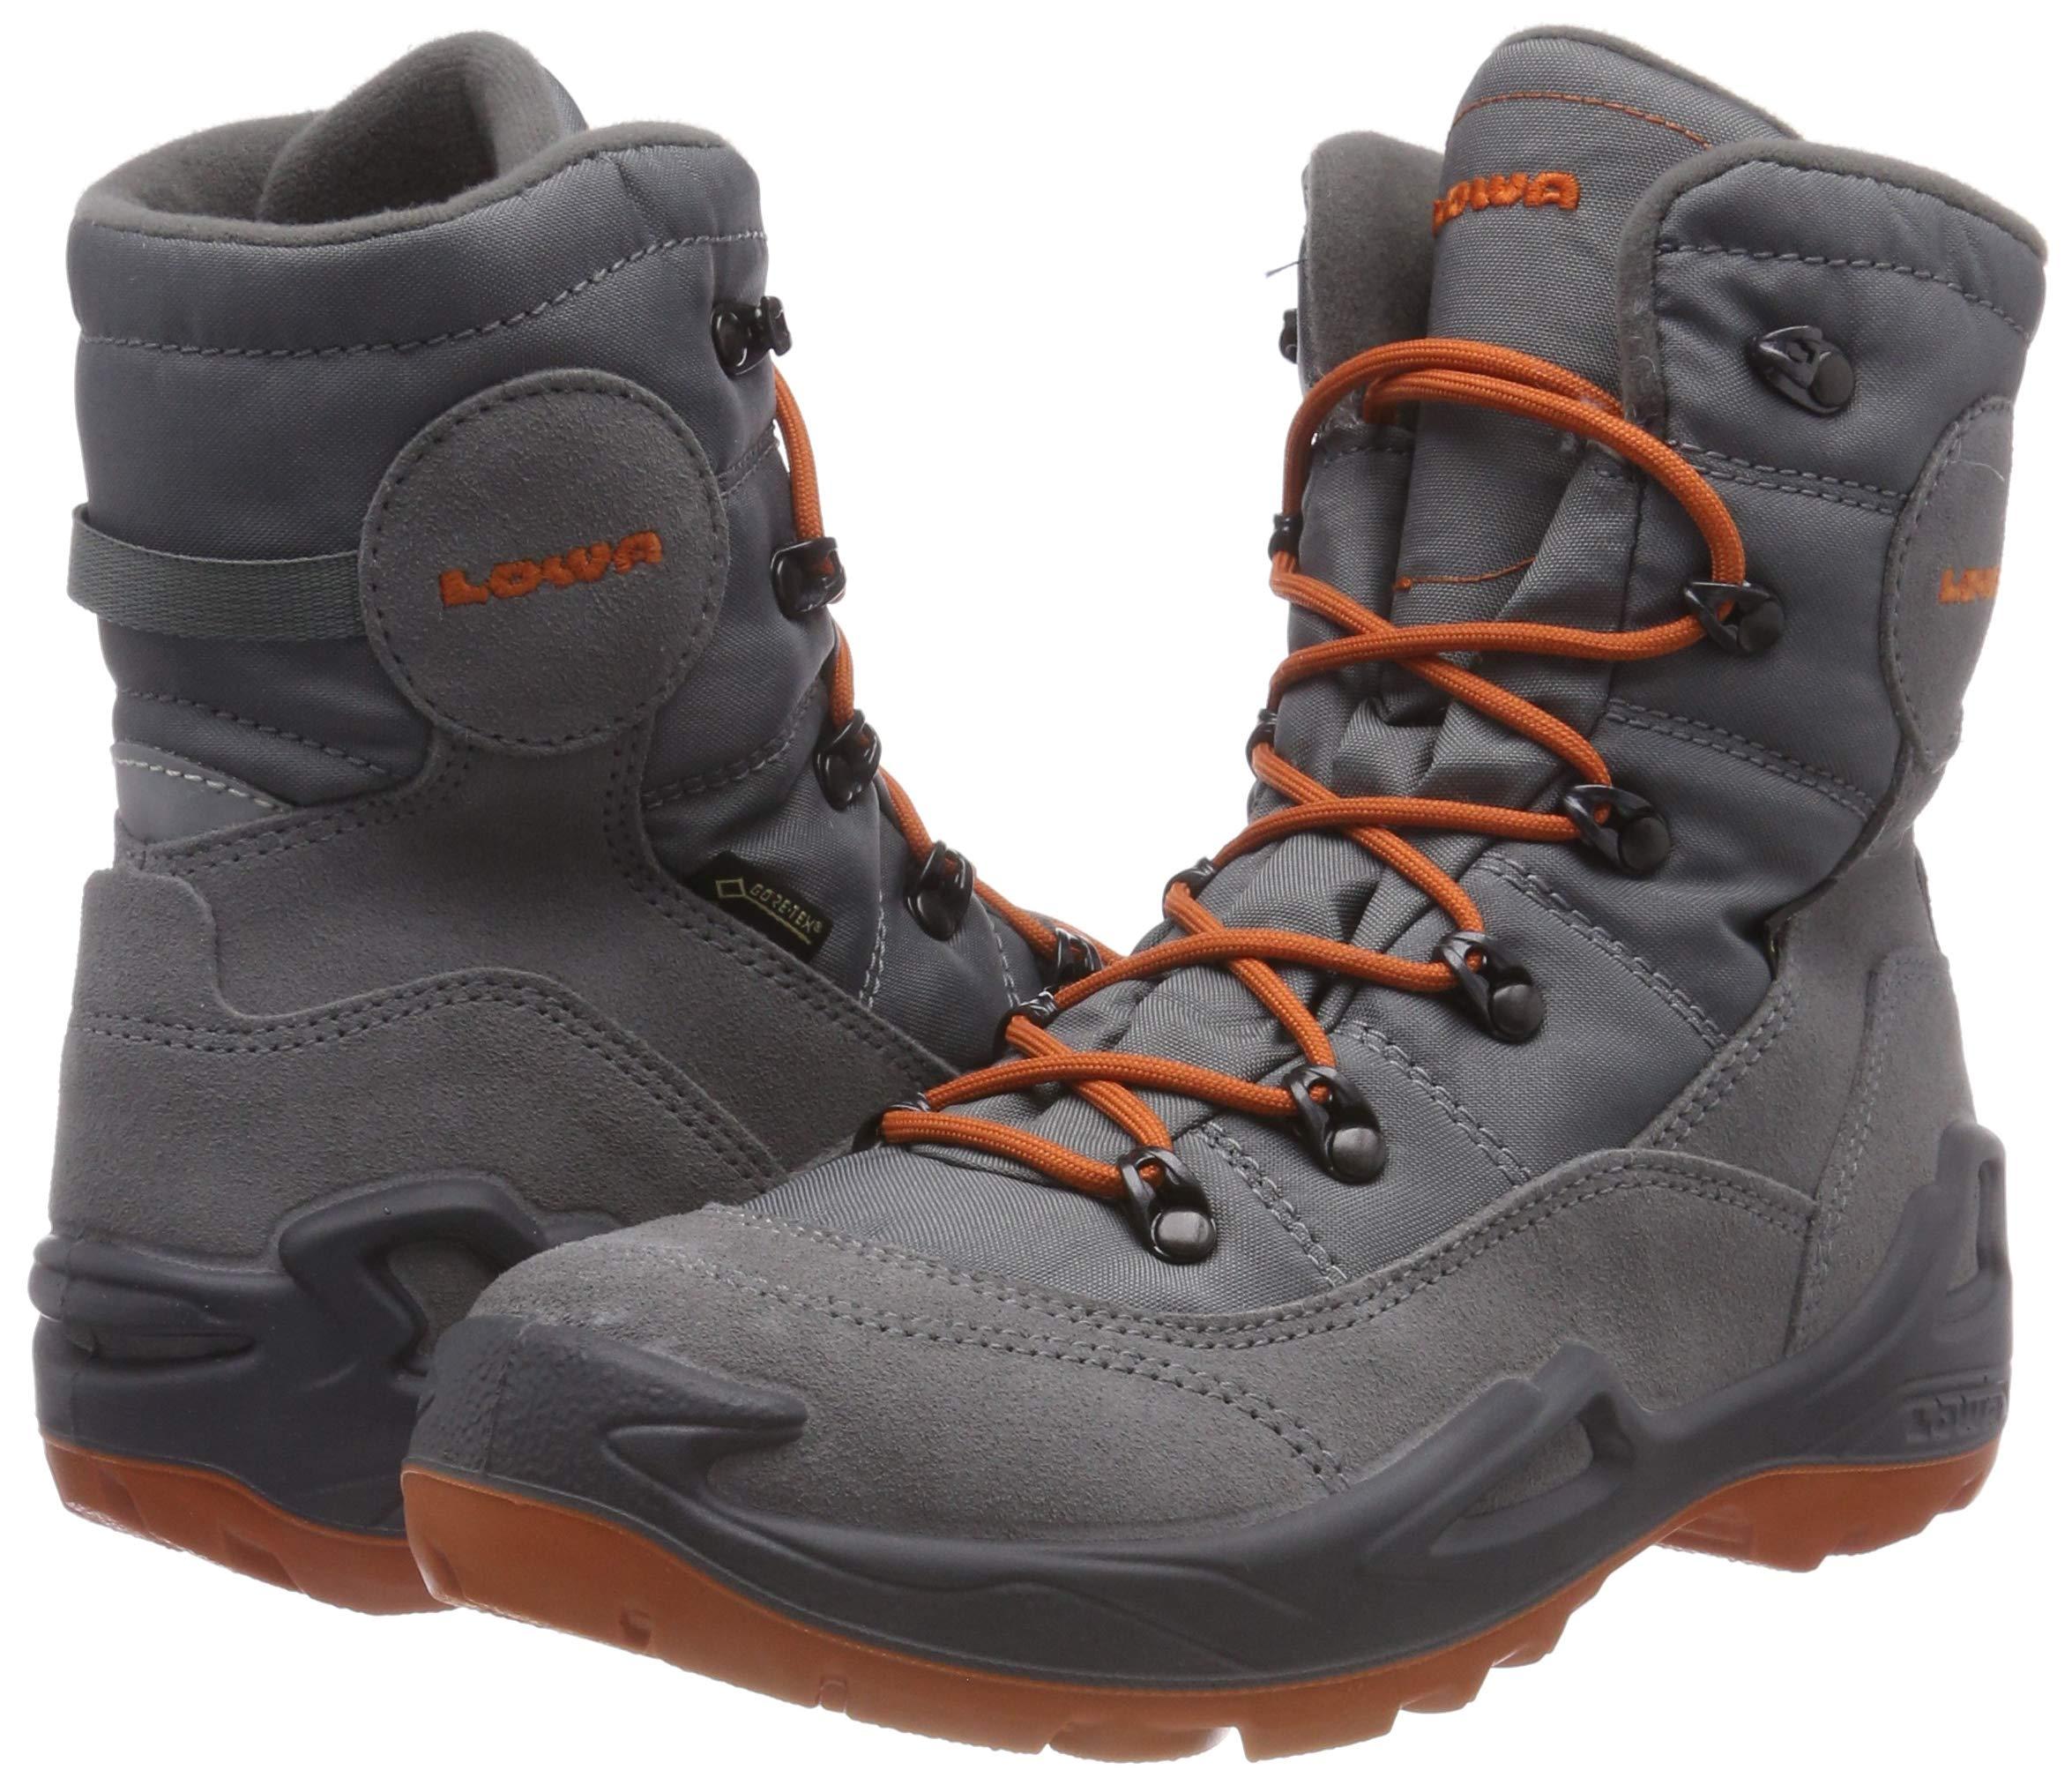 Lowa Unisex Kids Rufus Iii GTX Hi High Rise Hiking Boots 5